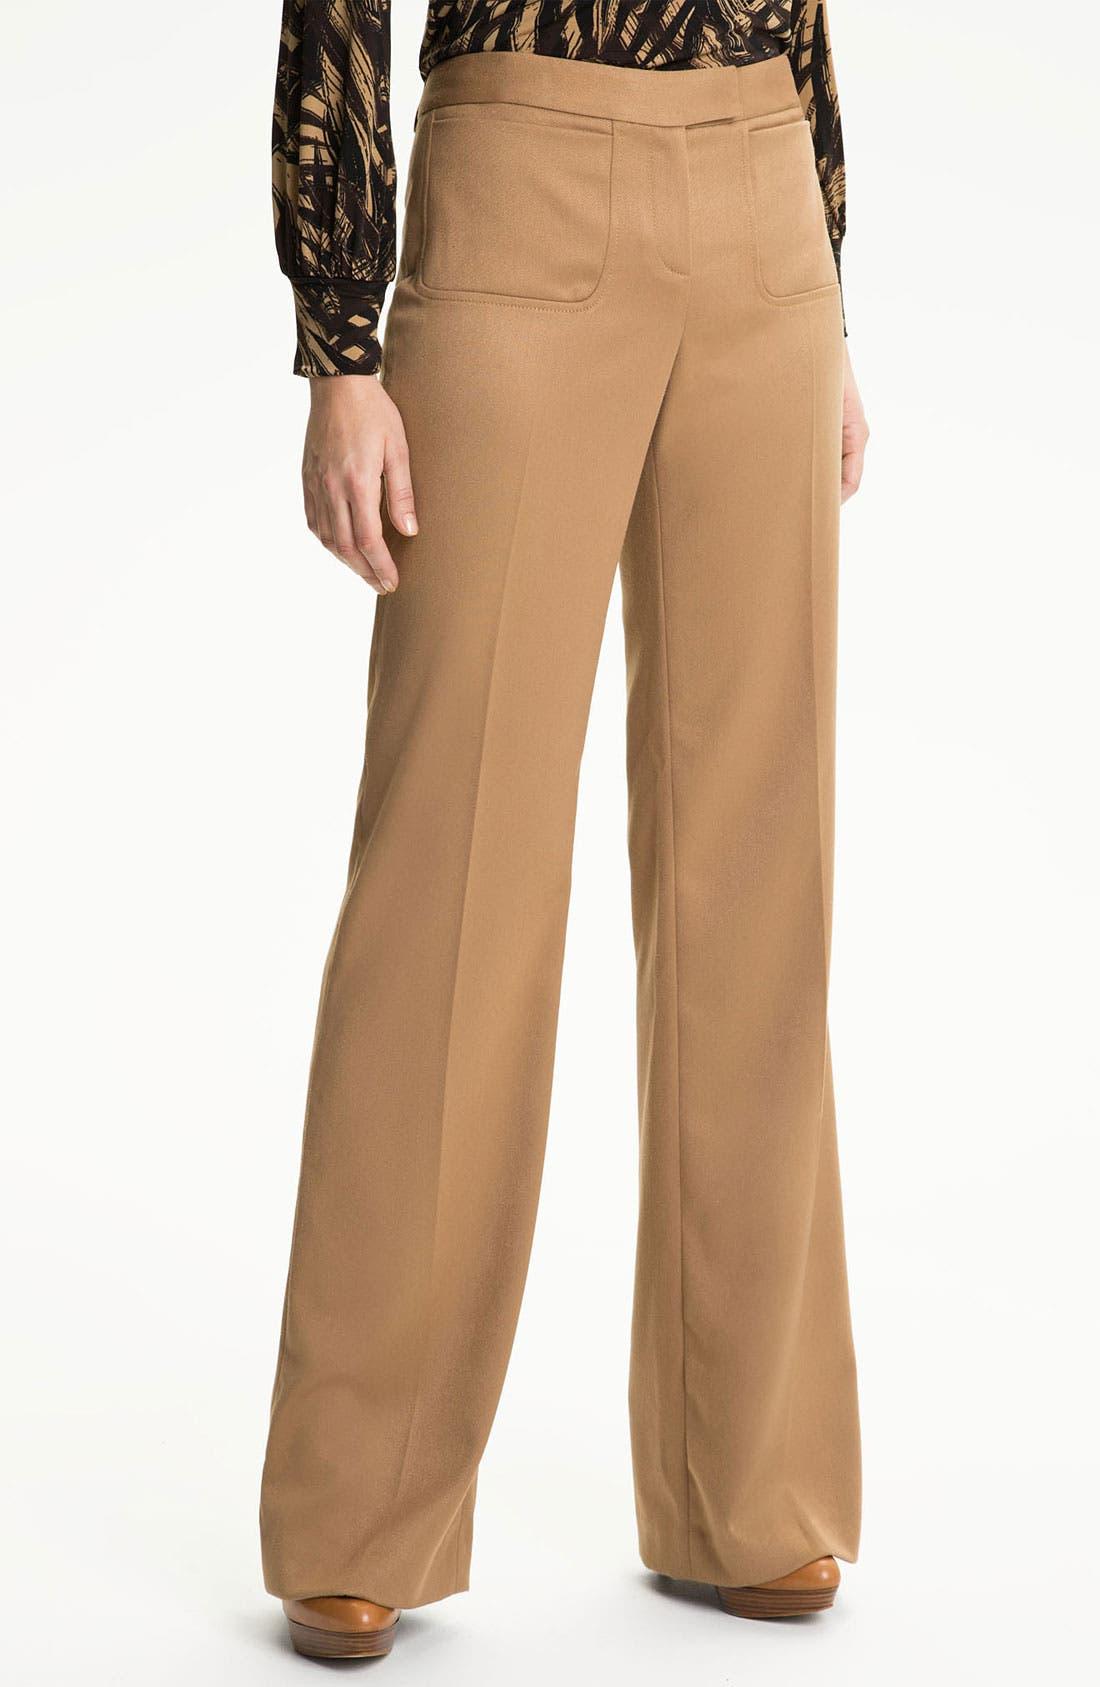 Alternate Image 1 Selected - Anne Klein Wide Leg Pants (Petite)